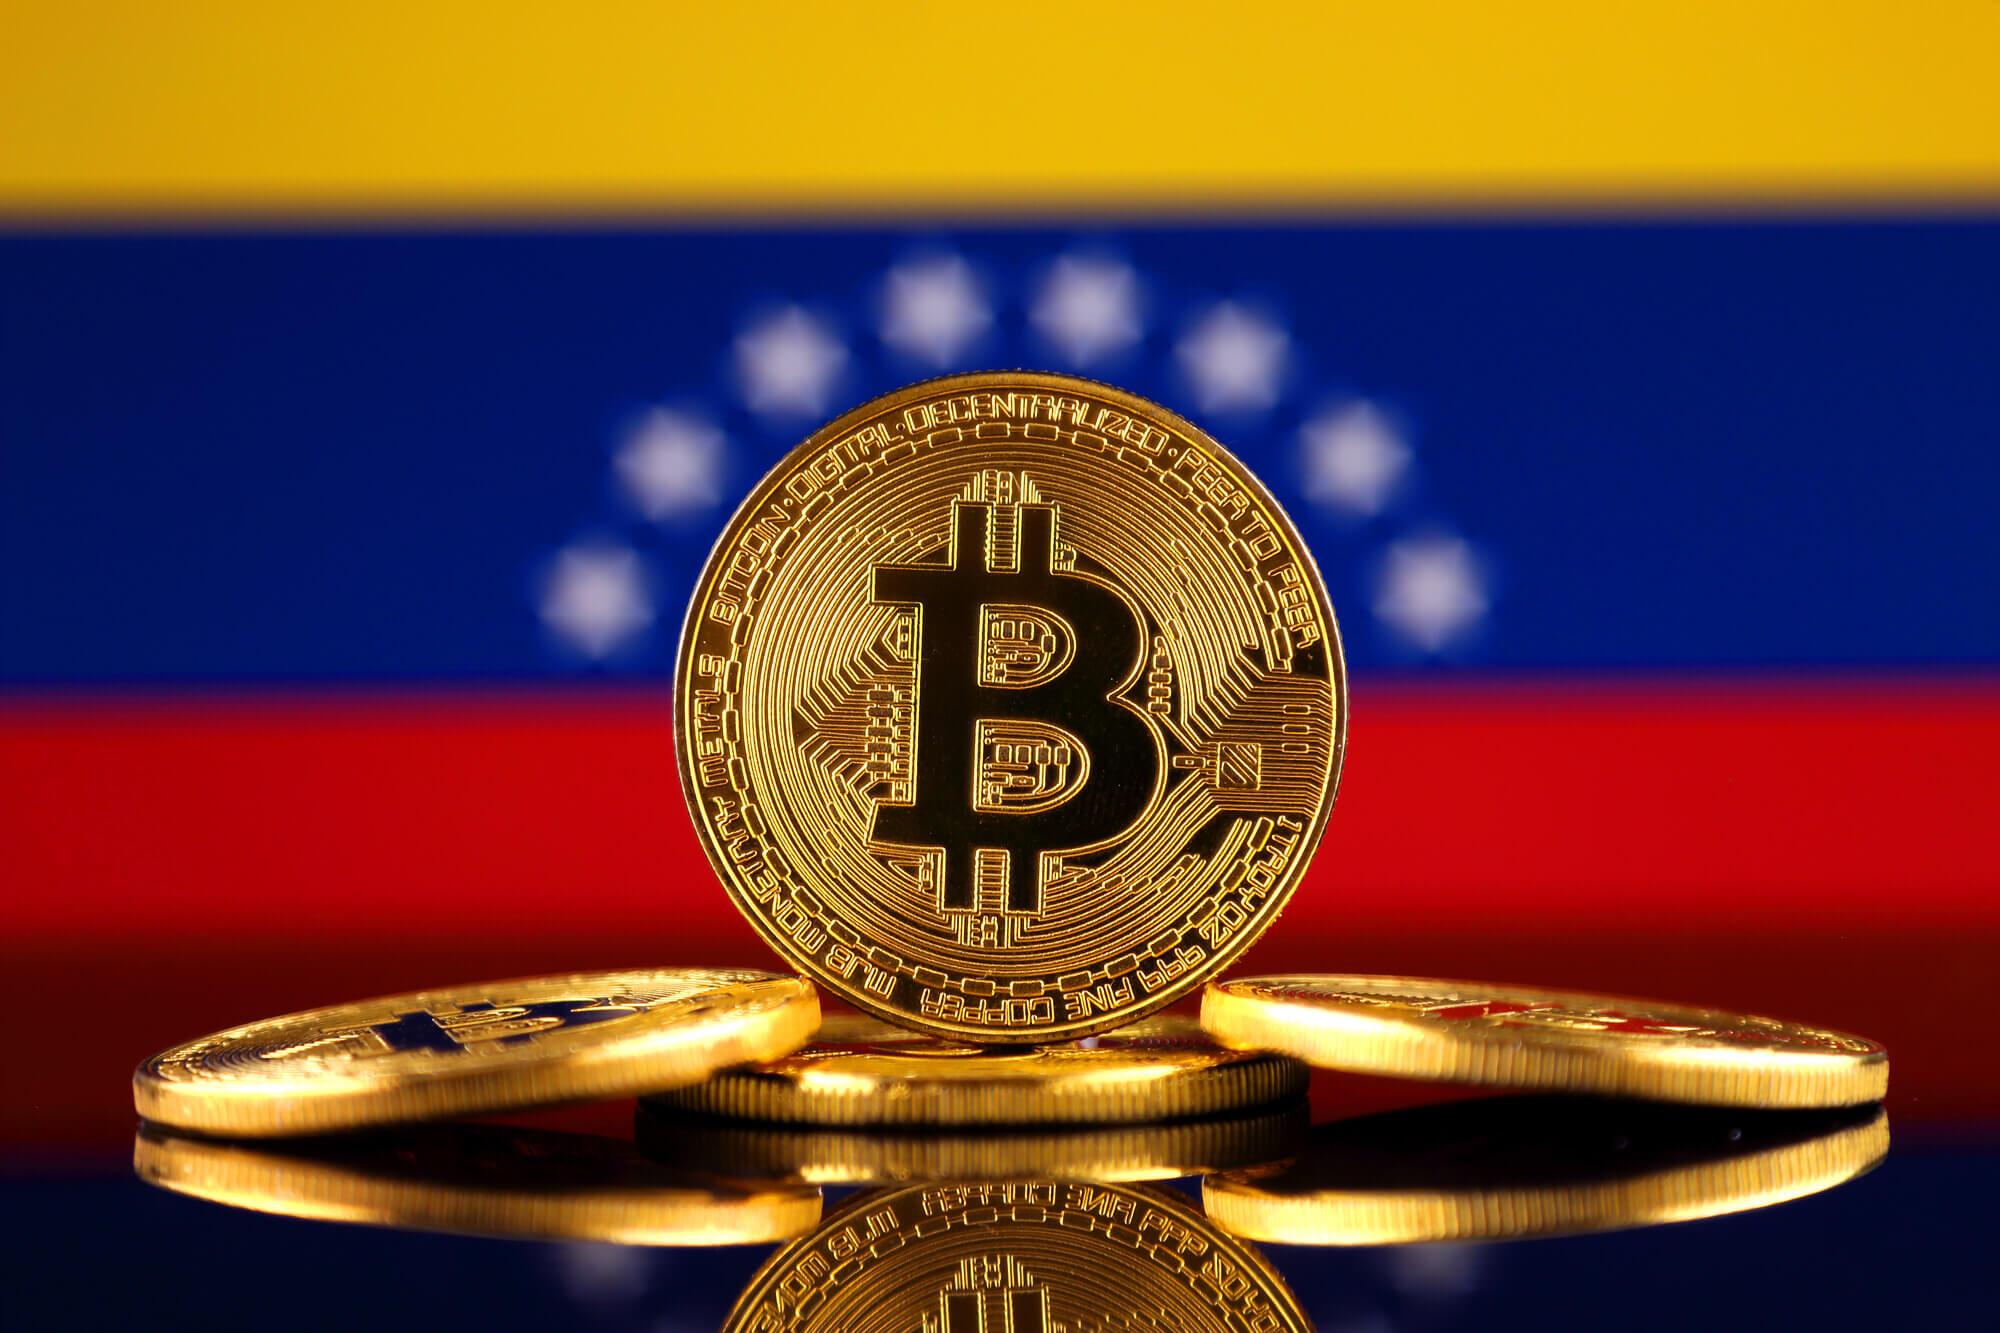 venezuelada enflasyon ile mücadelede bitcoin desteği